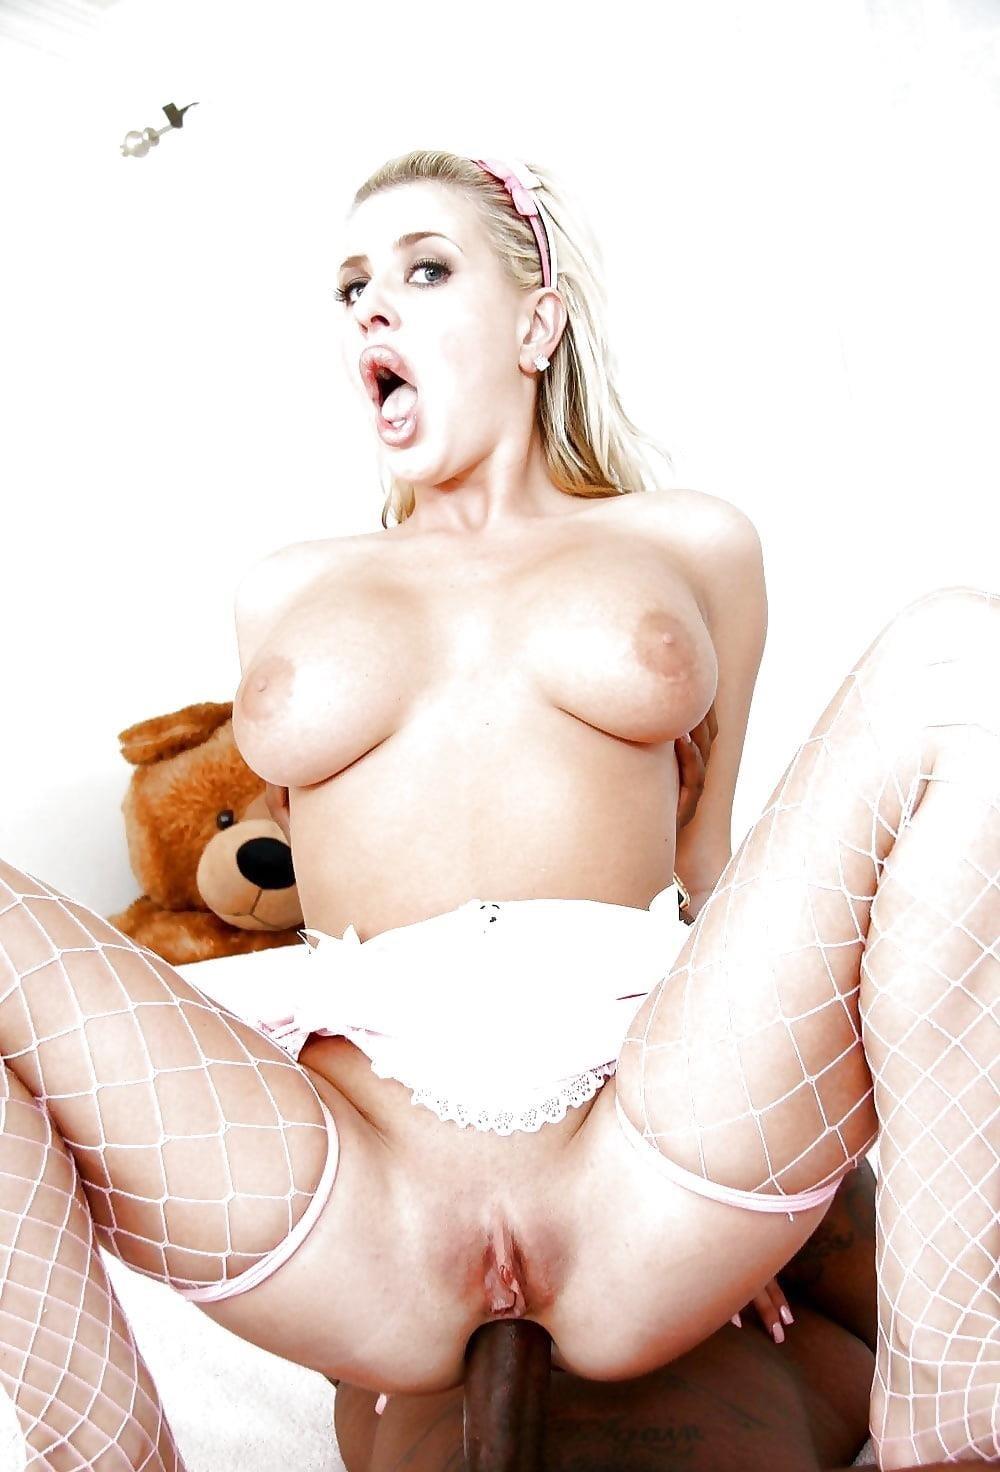 Big boobs anal porn pics-5892